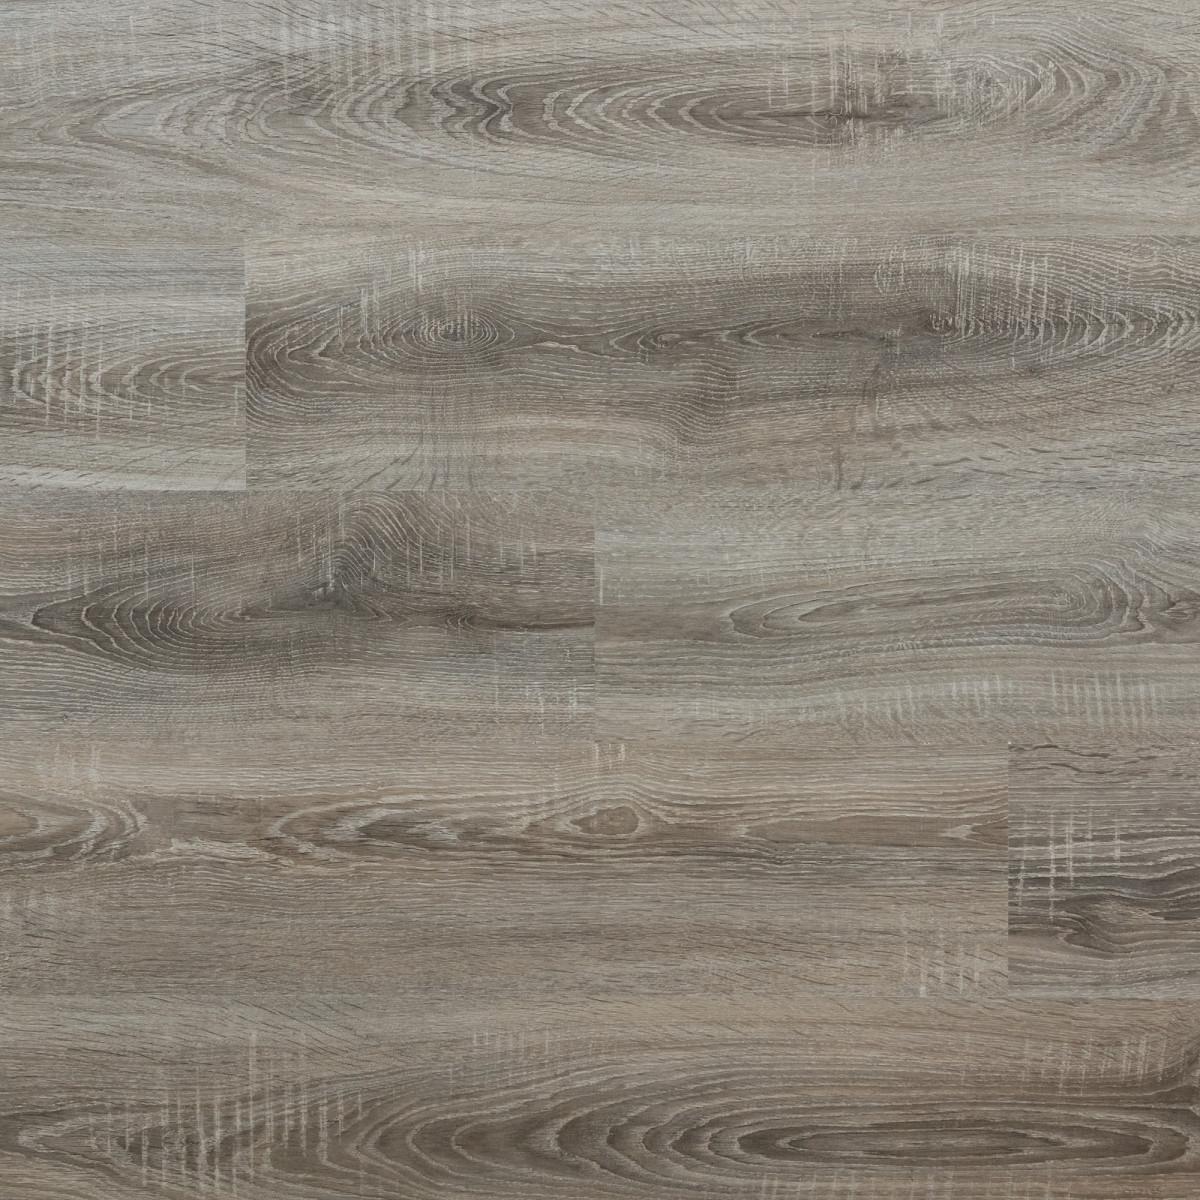 Ламинат Artens Кимито 33 класс толщина 12 мм 1.48 м²